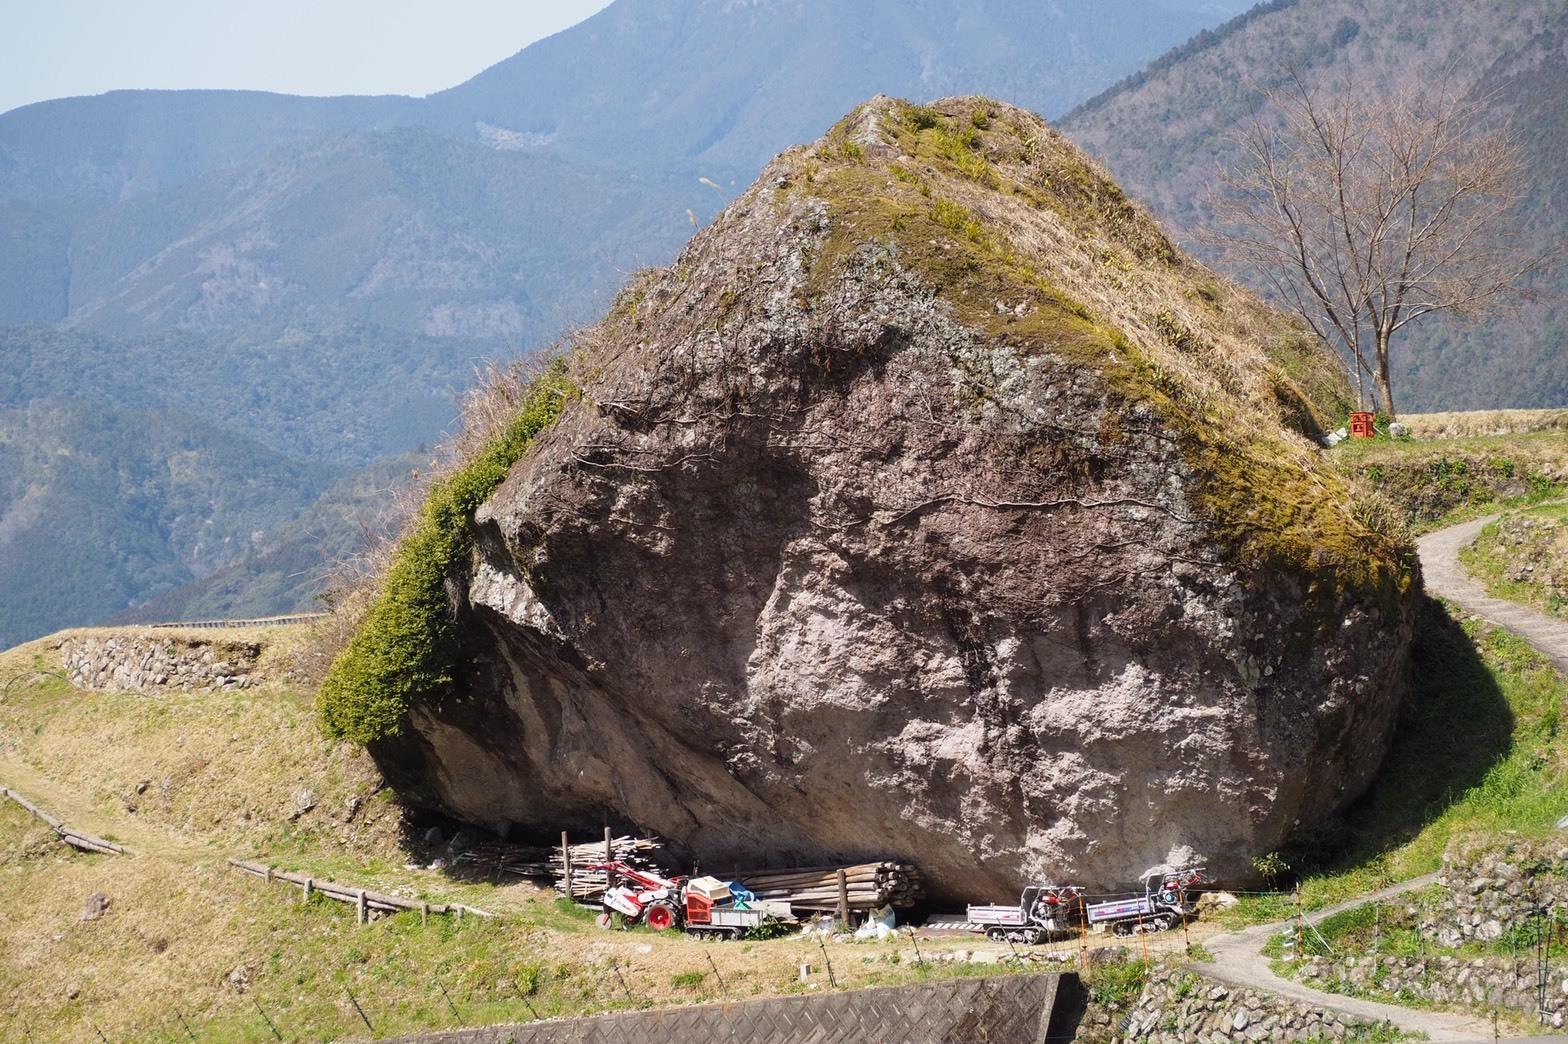 harleydavidson-motorcycle-touring-blog-kumano-mie-maruyama-senmakida-riceterraces-megalith.jpg